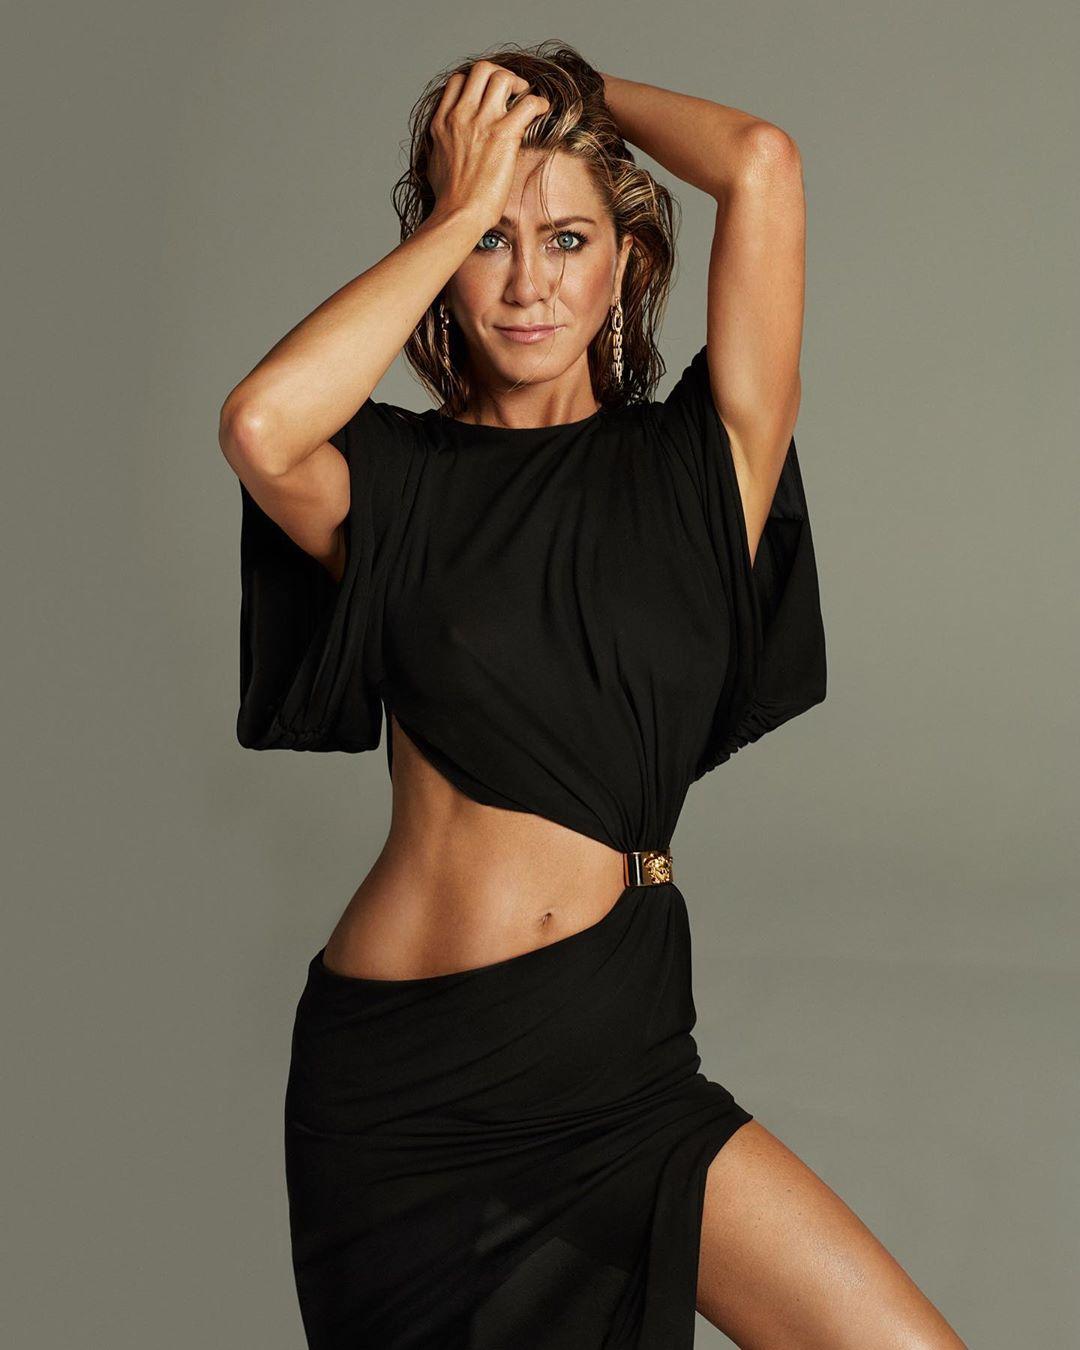 Subastan una foto de Jennifer Aniston desnuda para